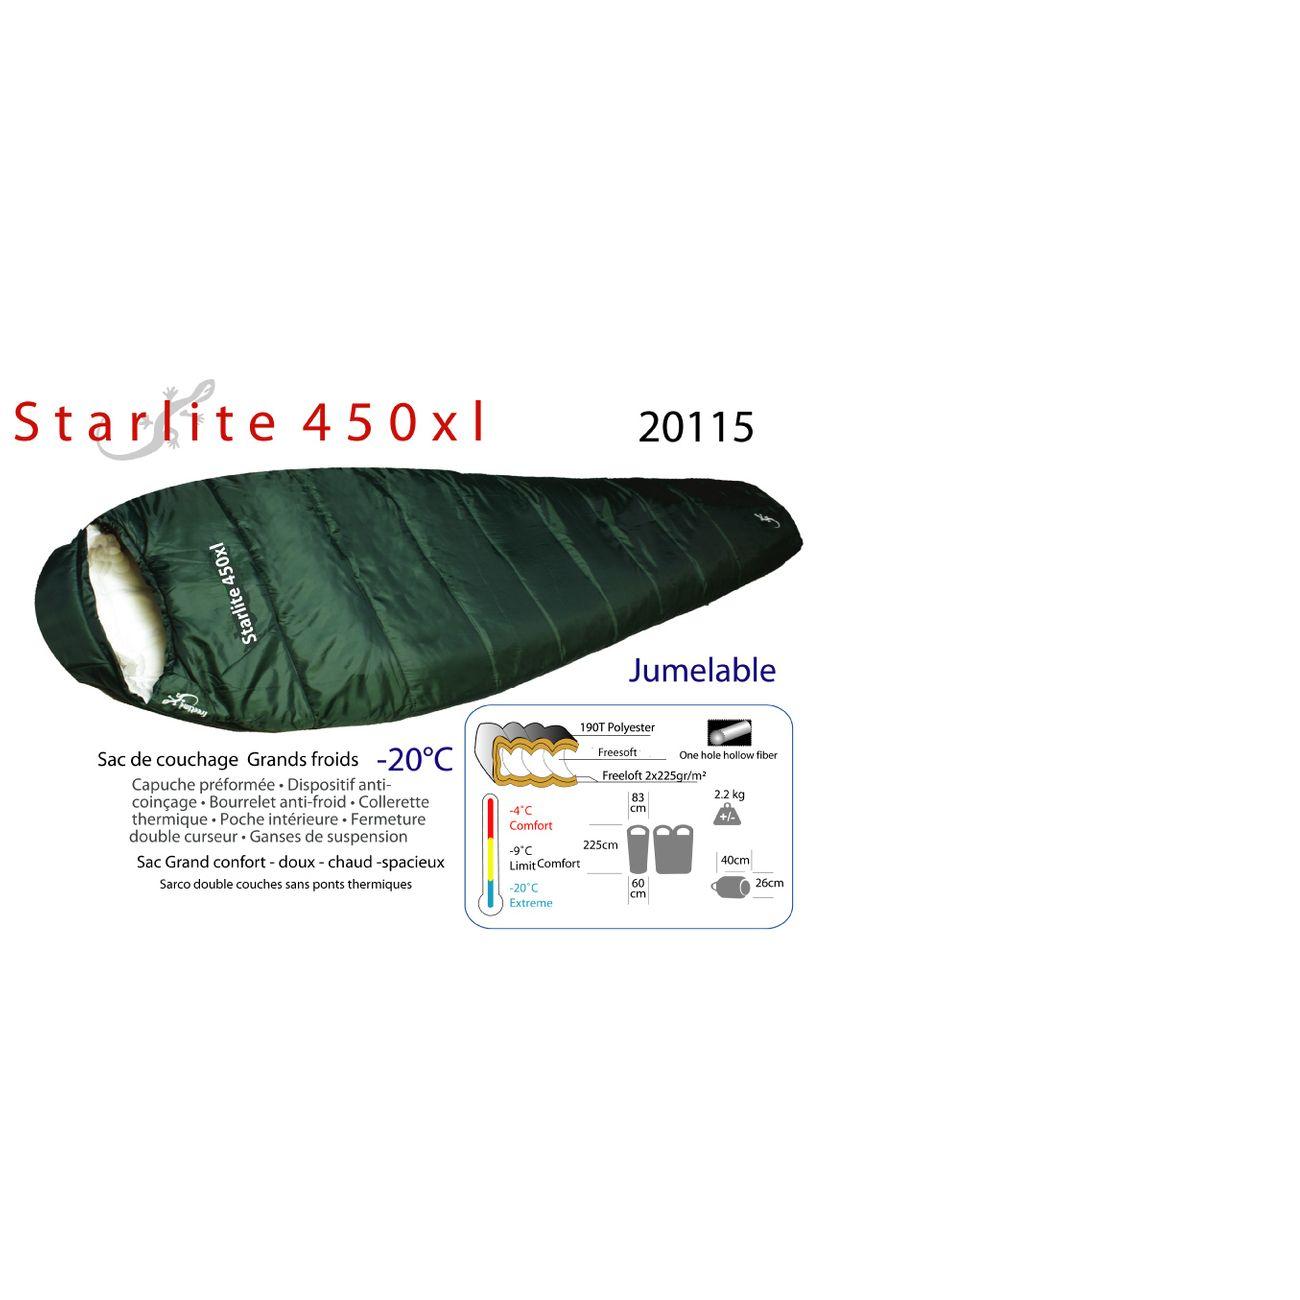 Camping  FREETIME Starlite 450xl STARLITE 450XL-sacs de couchage grand froids-Sacs de couchage - 20°C - sac  4 saisons